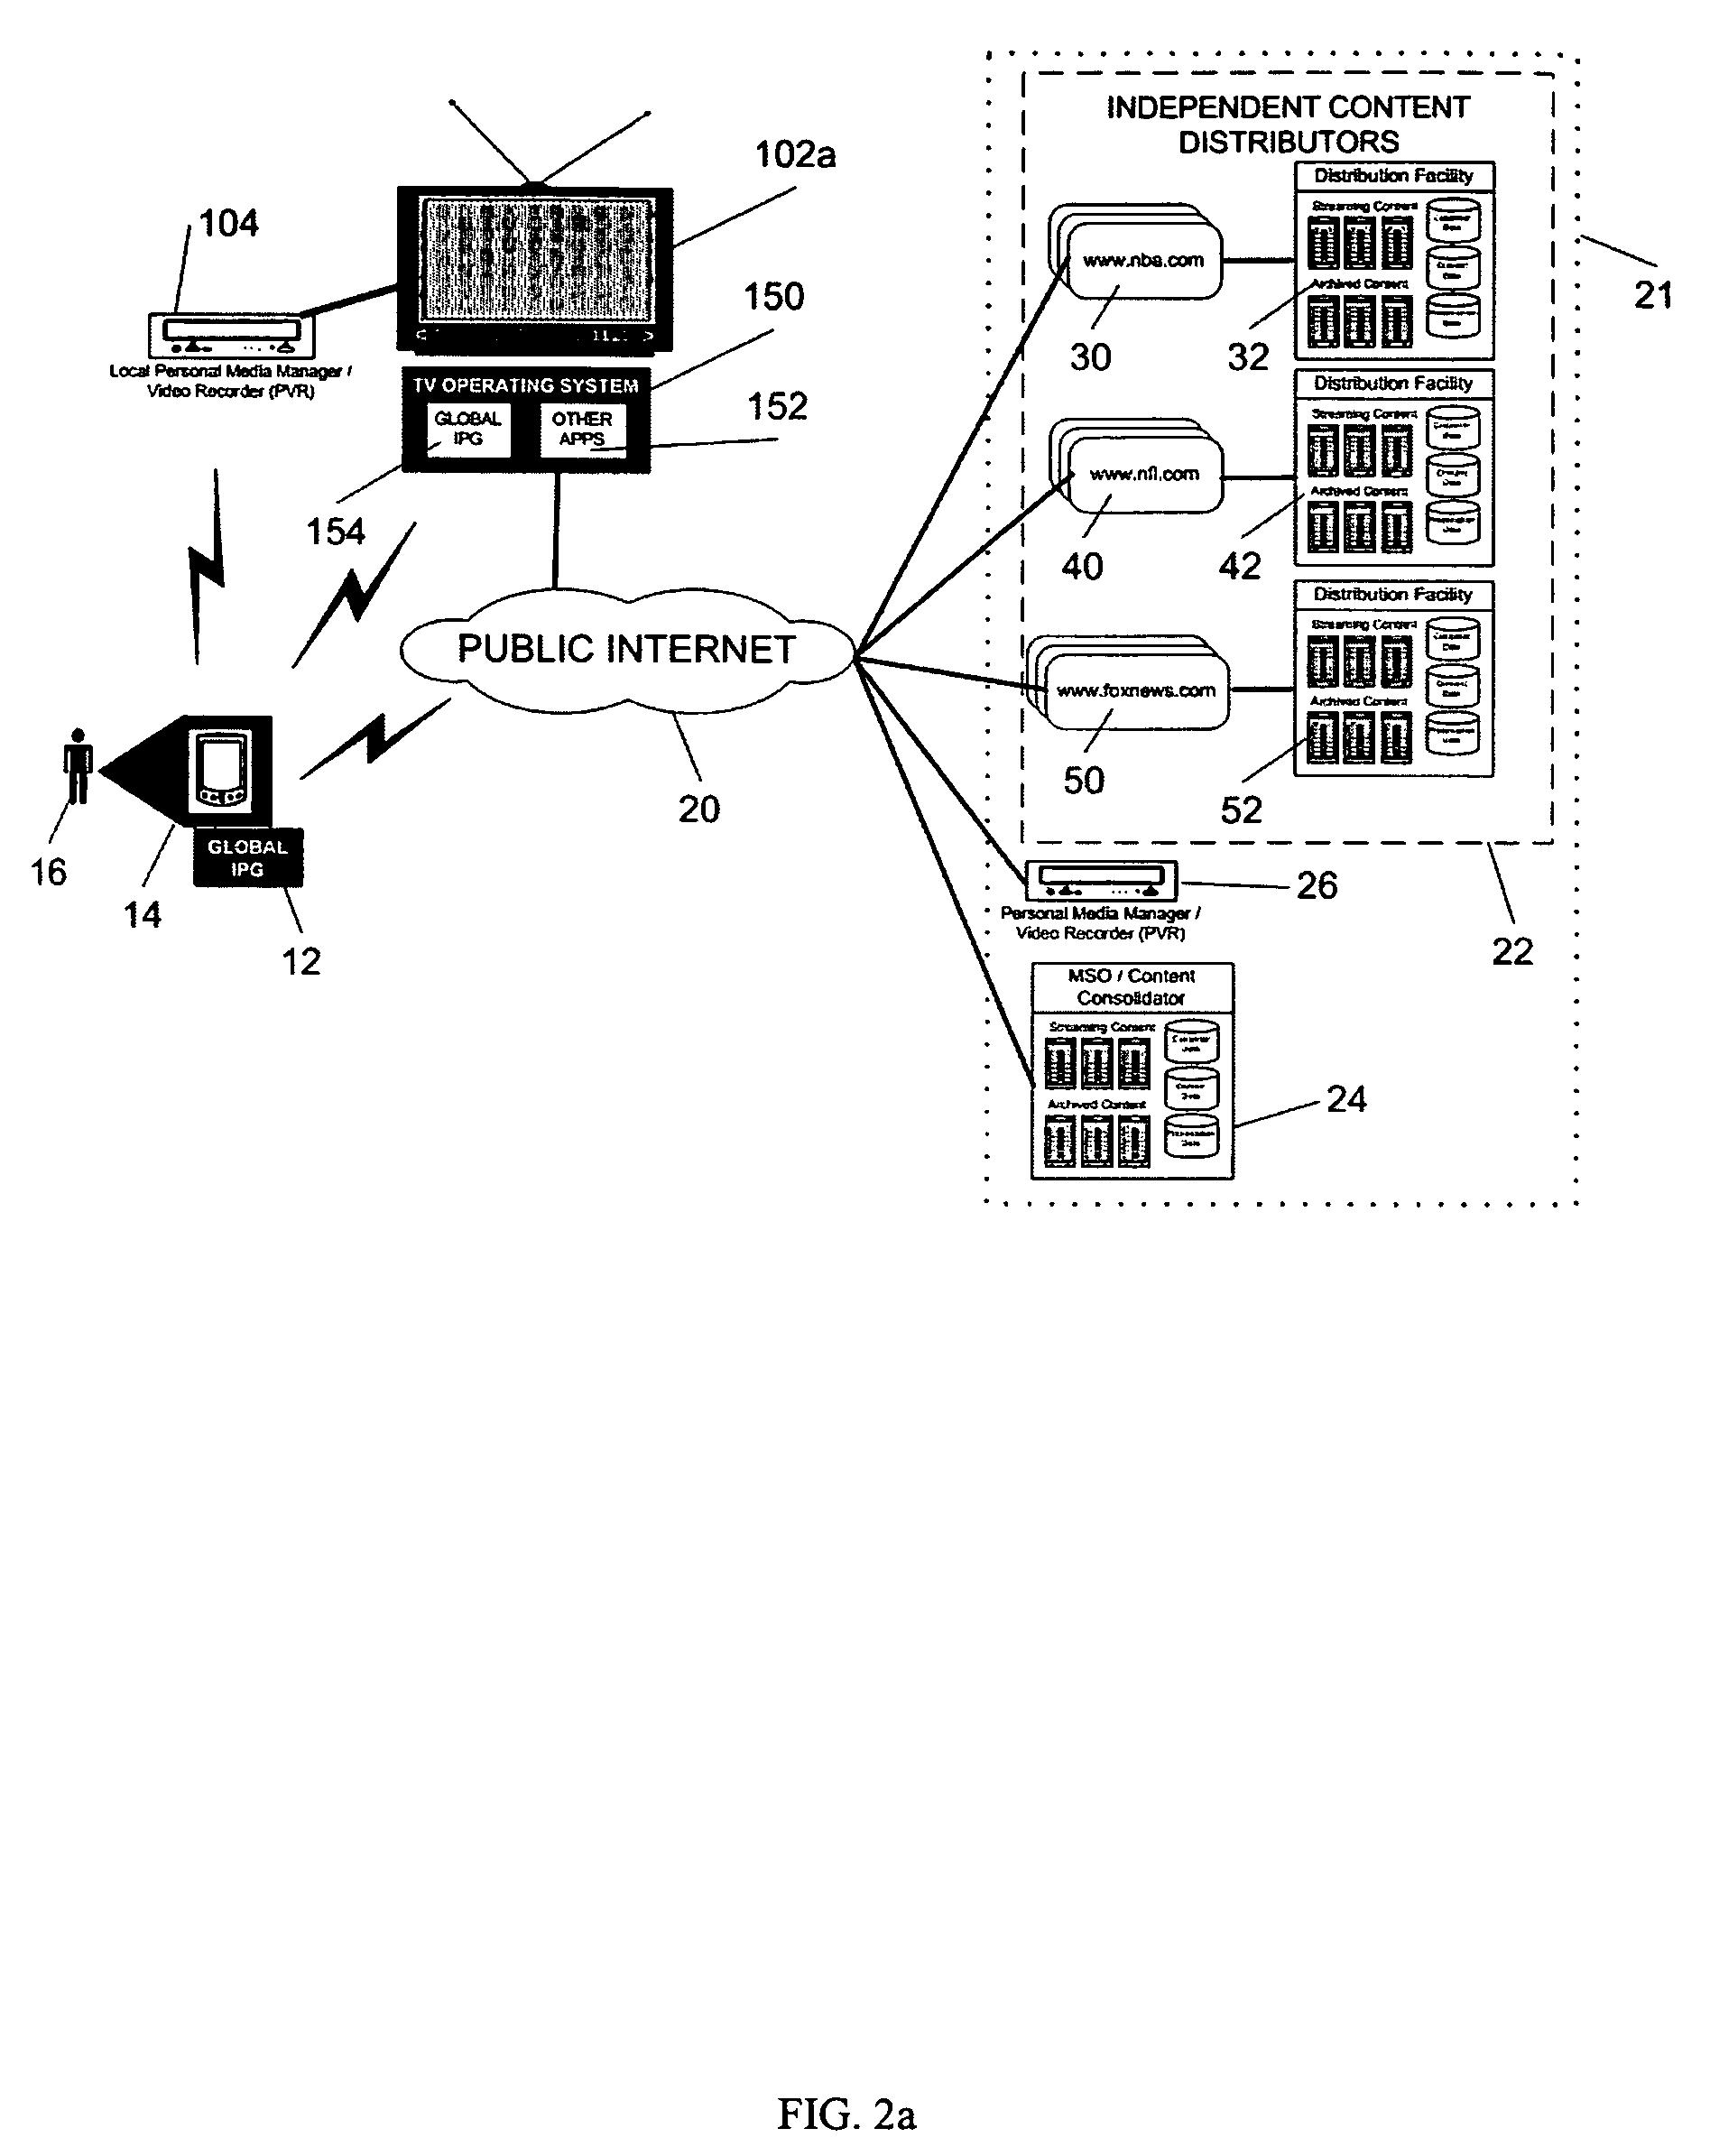 Patent US 8,656,431 B2